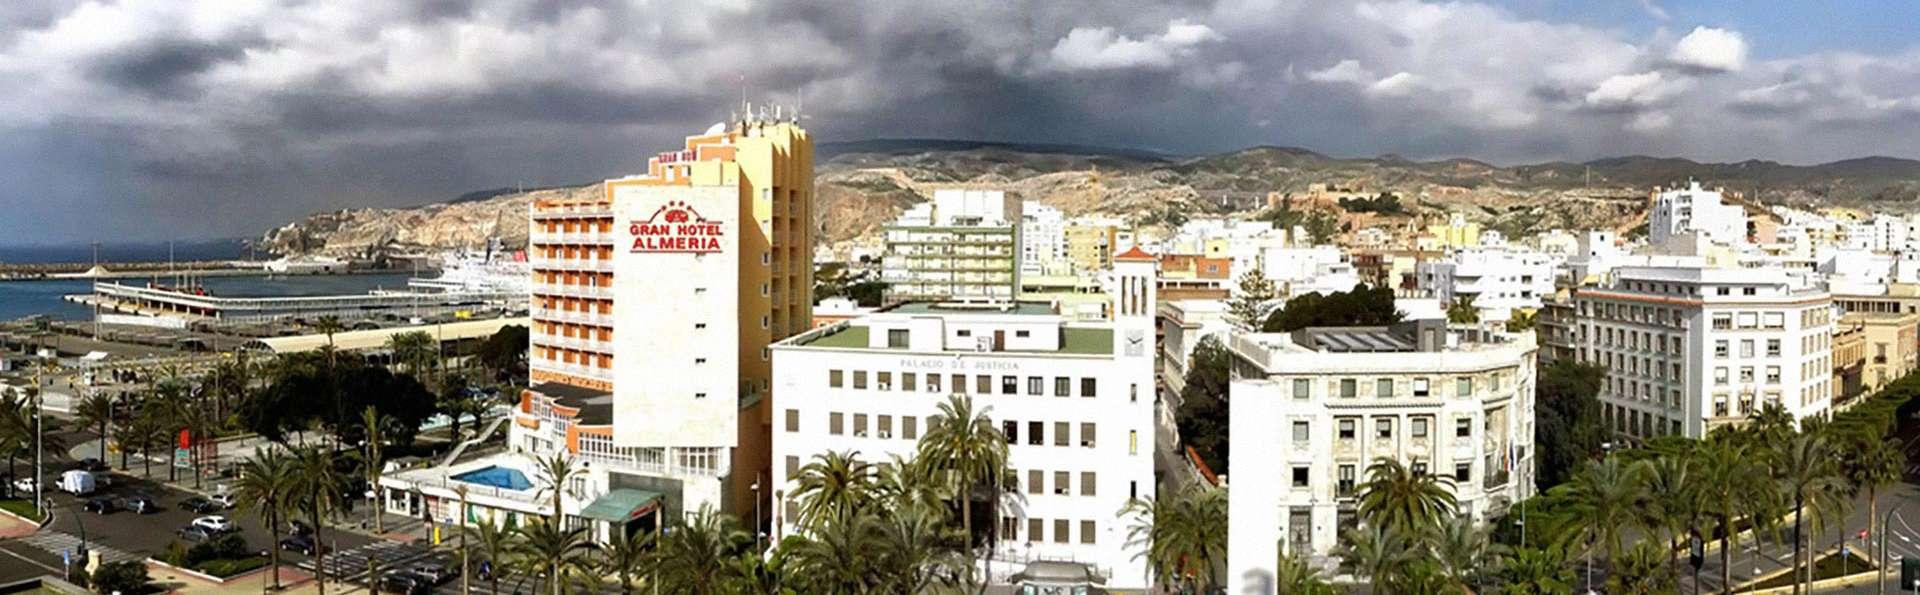 Ohtels Gran Hotel Almería - EDIT_FRONT_03.jpg